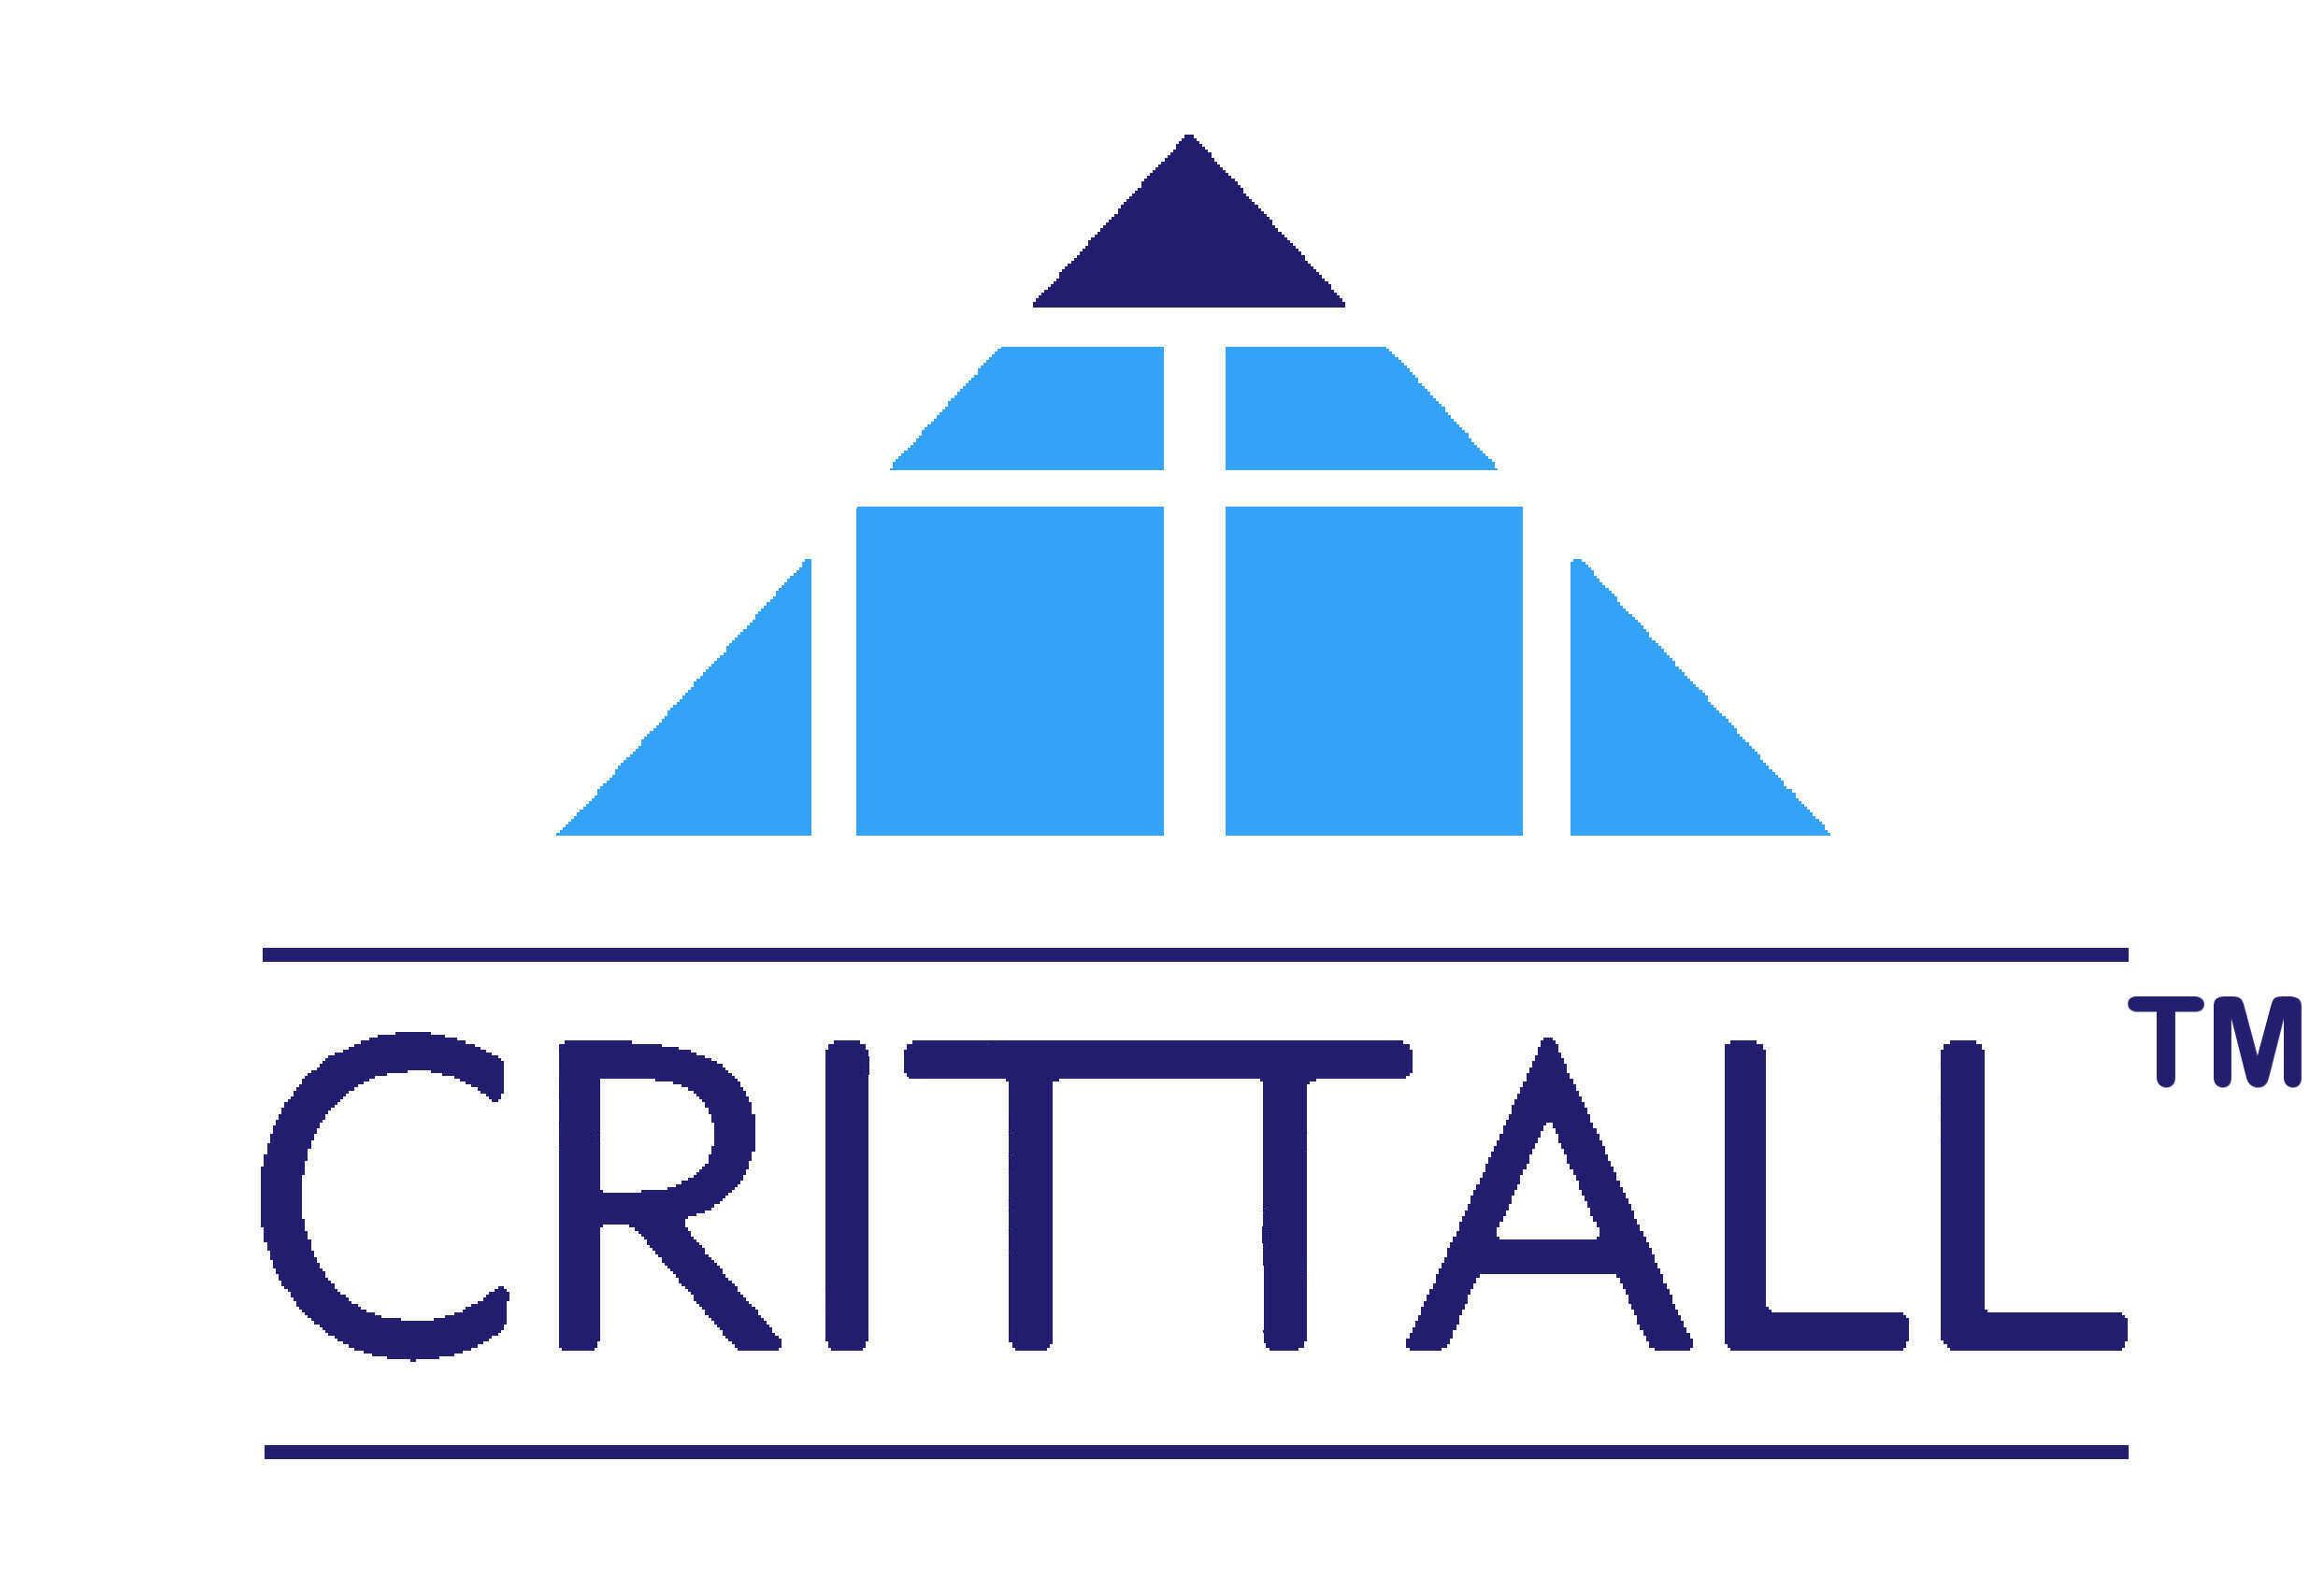 Crittall